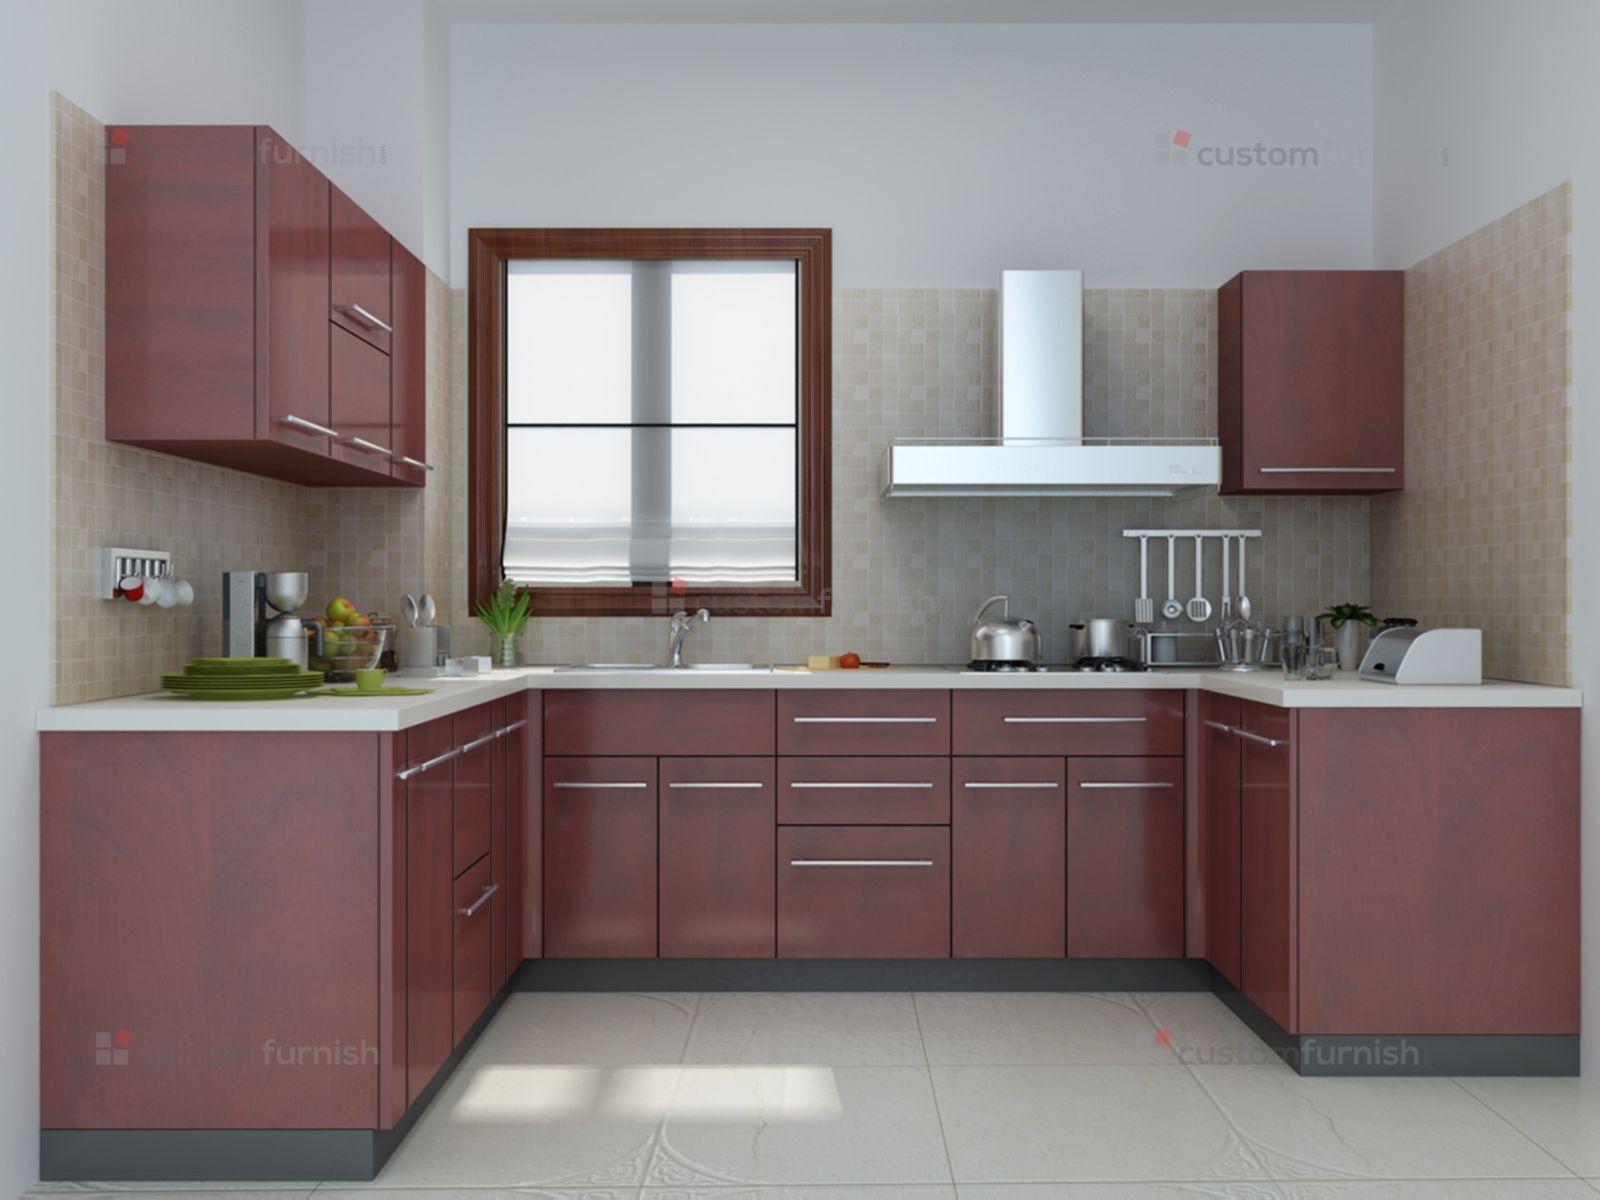 U shaped modular kitchen design  U shaped modular Kitchen designs in 2019  Interior design